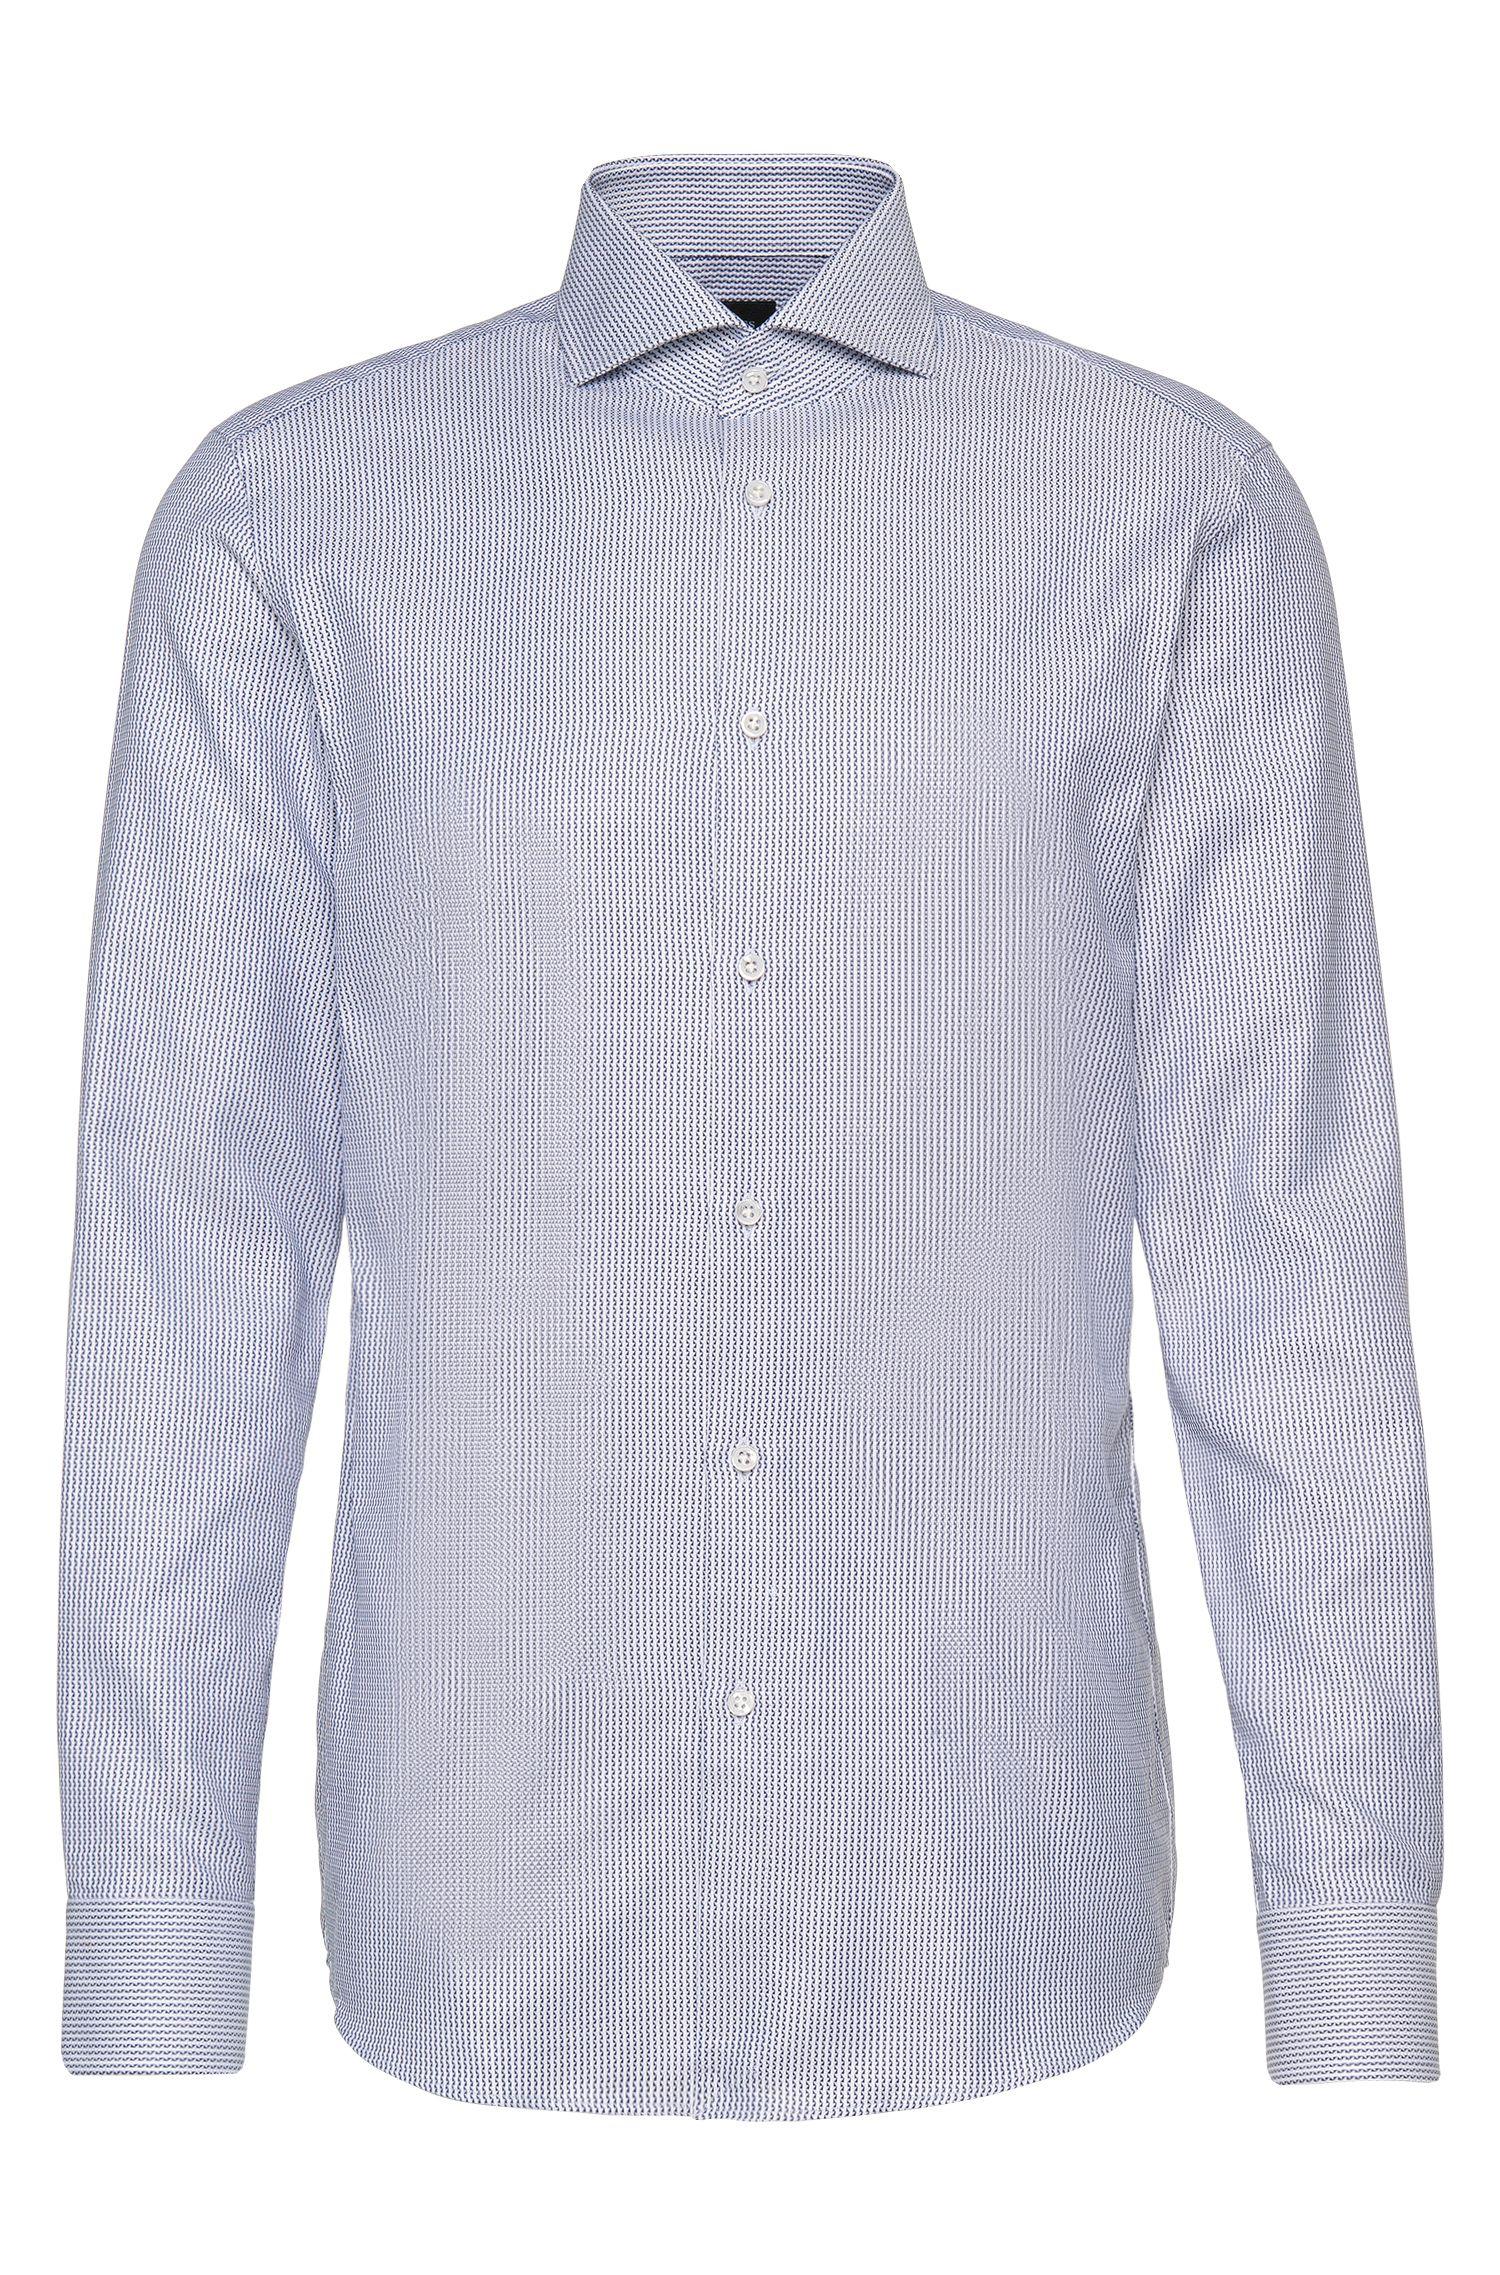 Striped Italian Cotton Dress Shirt, Slim Fit | T-Christo